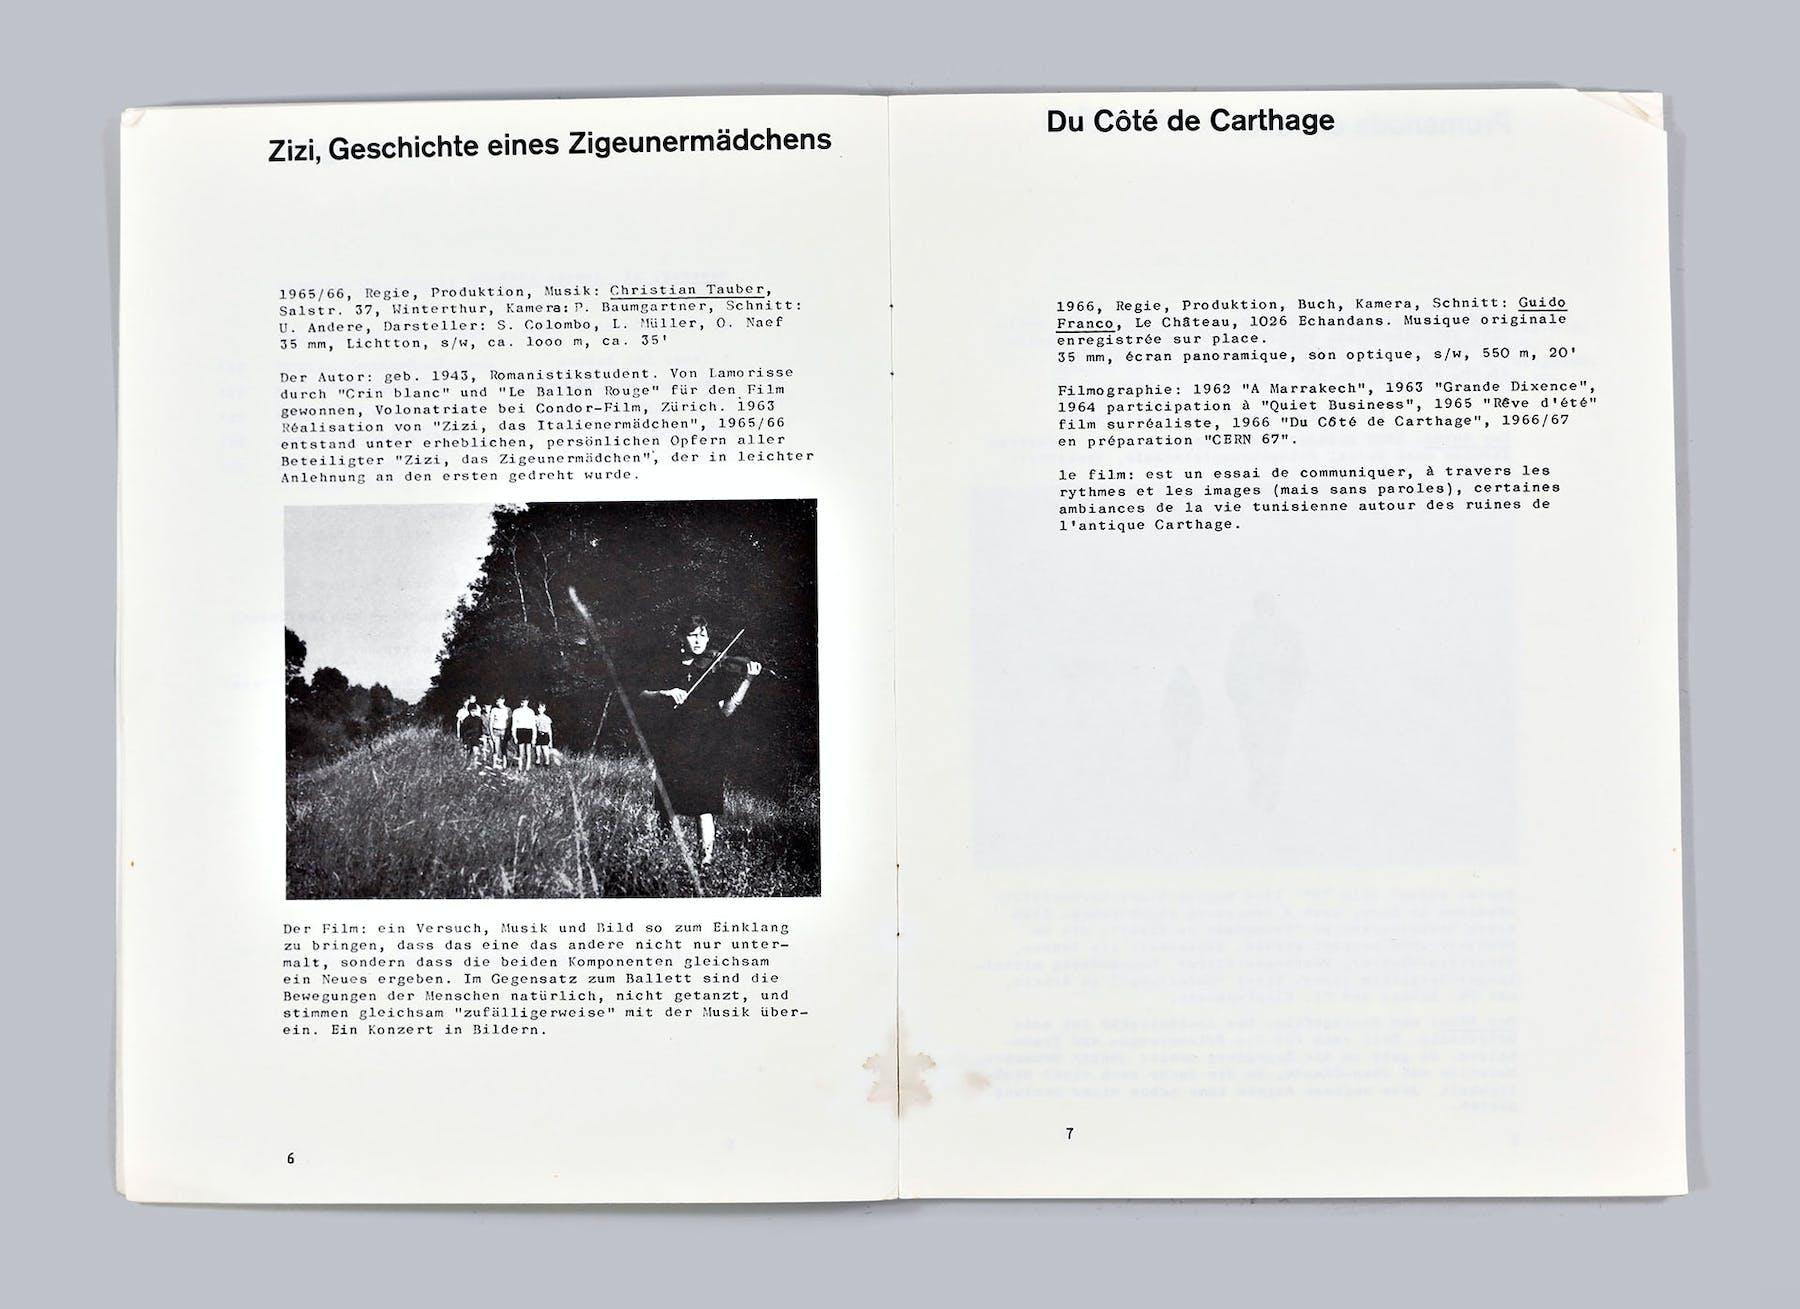 Image 1 de Zizi, Geschichte eines Zigeunermädchens